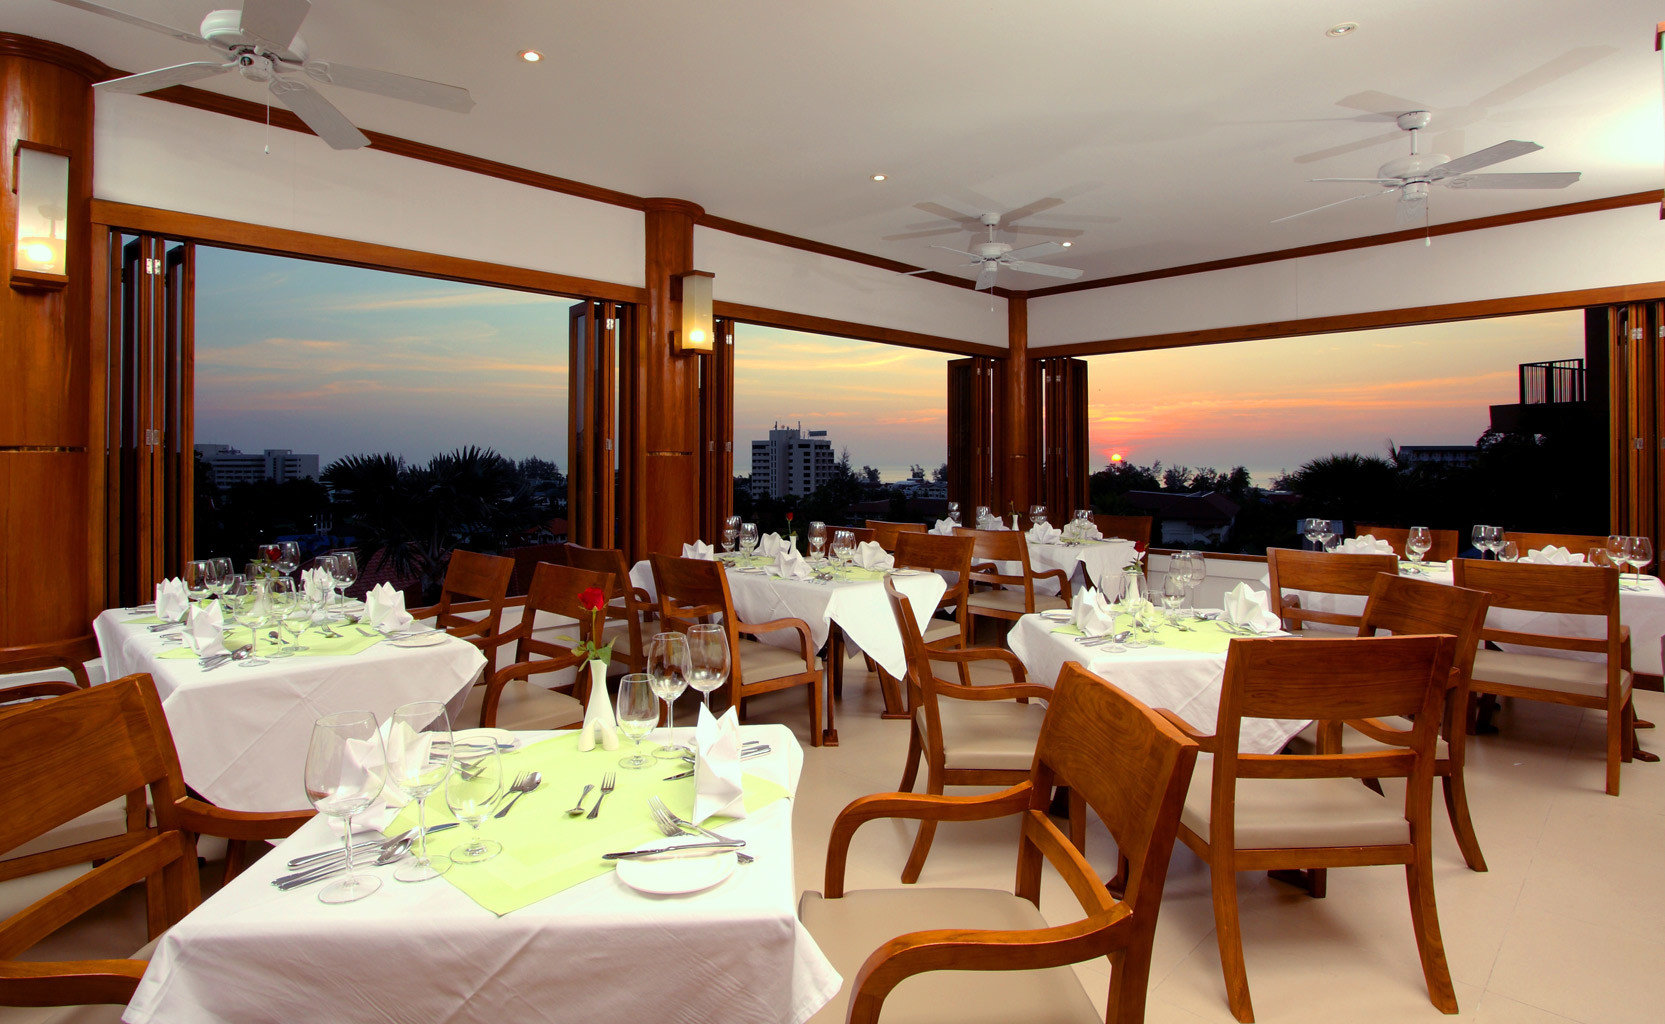 B&B Beachfront Dining Drink Eat chair restaurant function hall Resort Suite